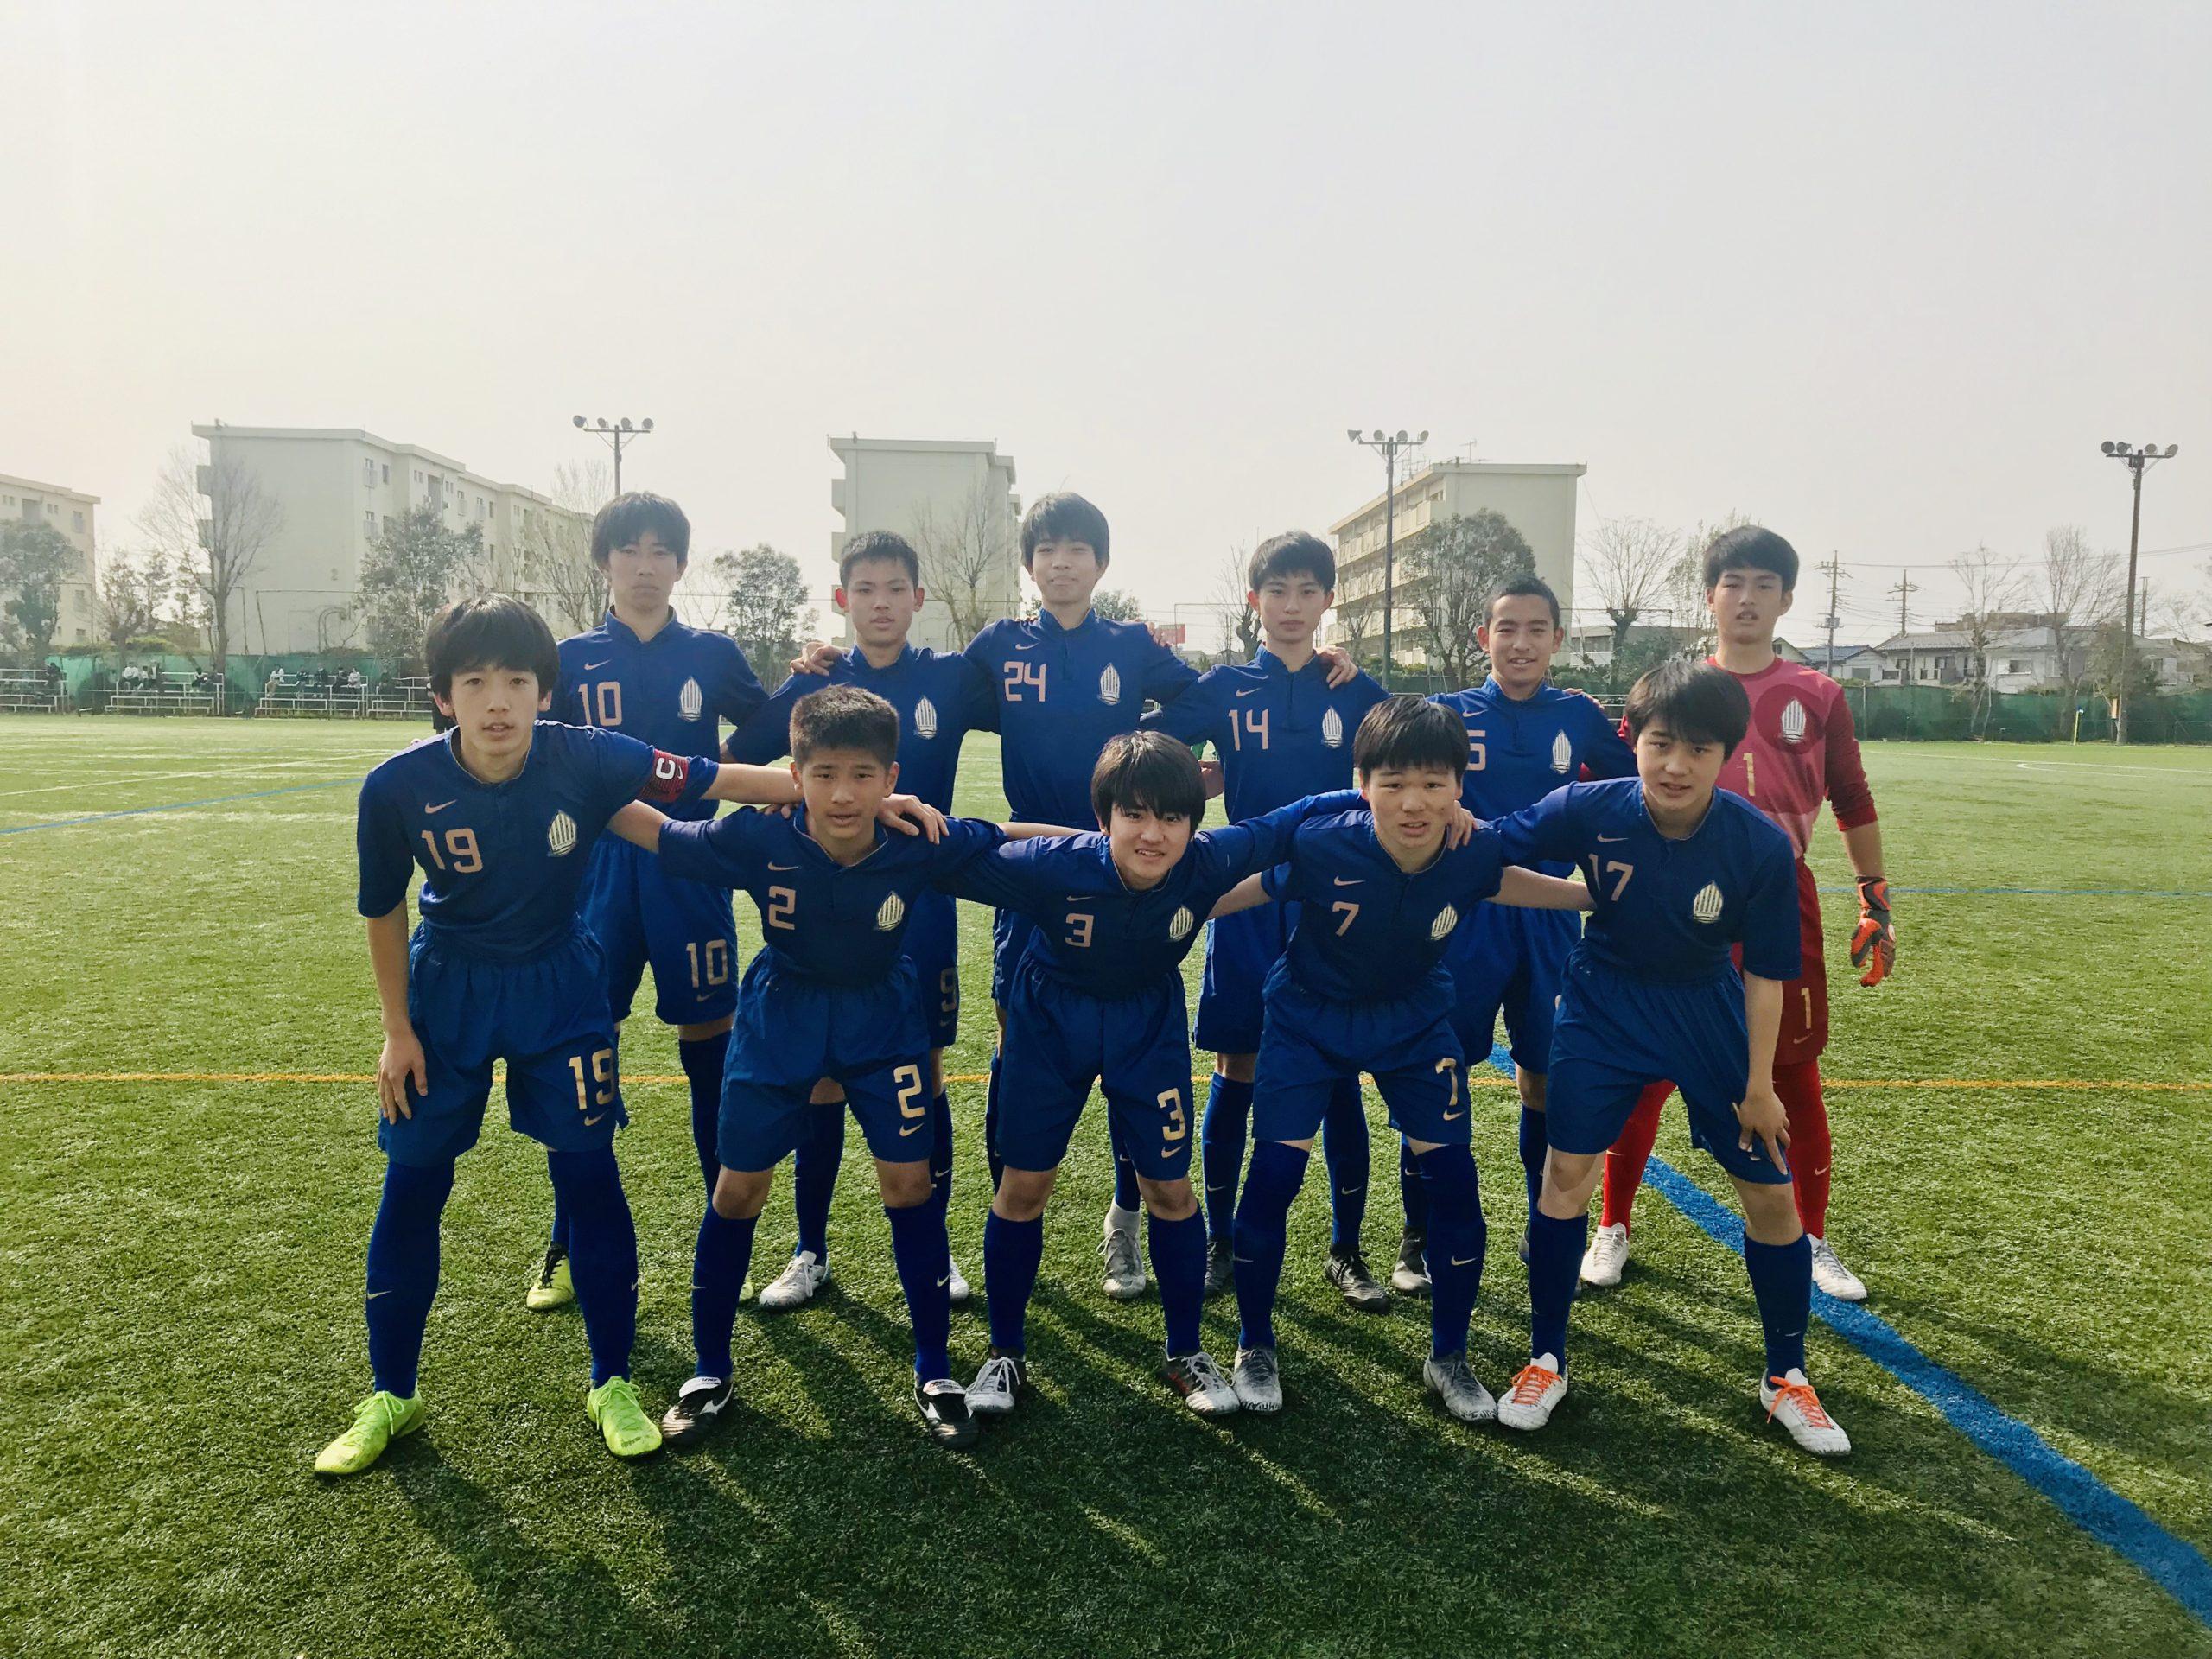 【U15】高円宮杯 U-15サッカー千葉県1部リーグ 第8節